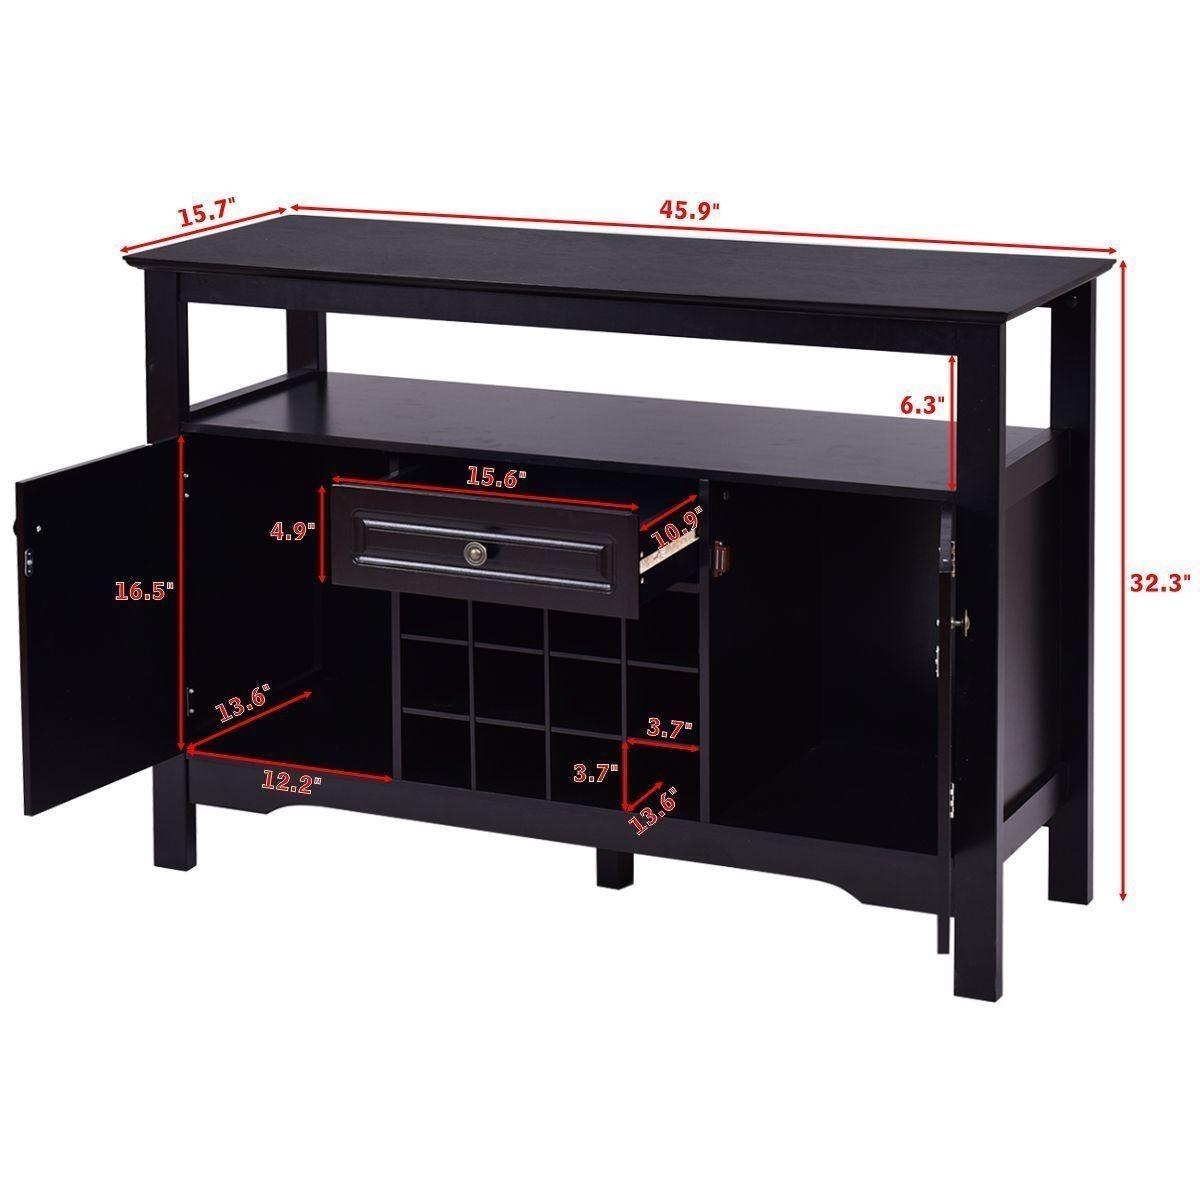 Moderno Mueble Bufet Negro Composición - Muebles Para Ideas de ...